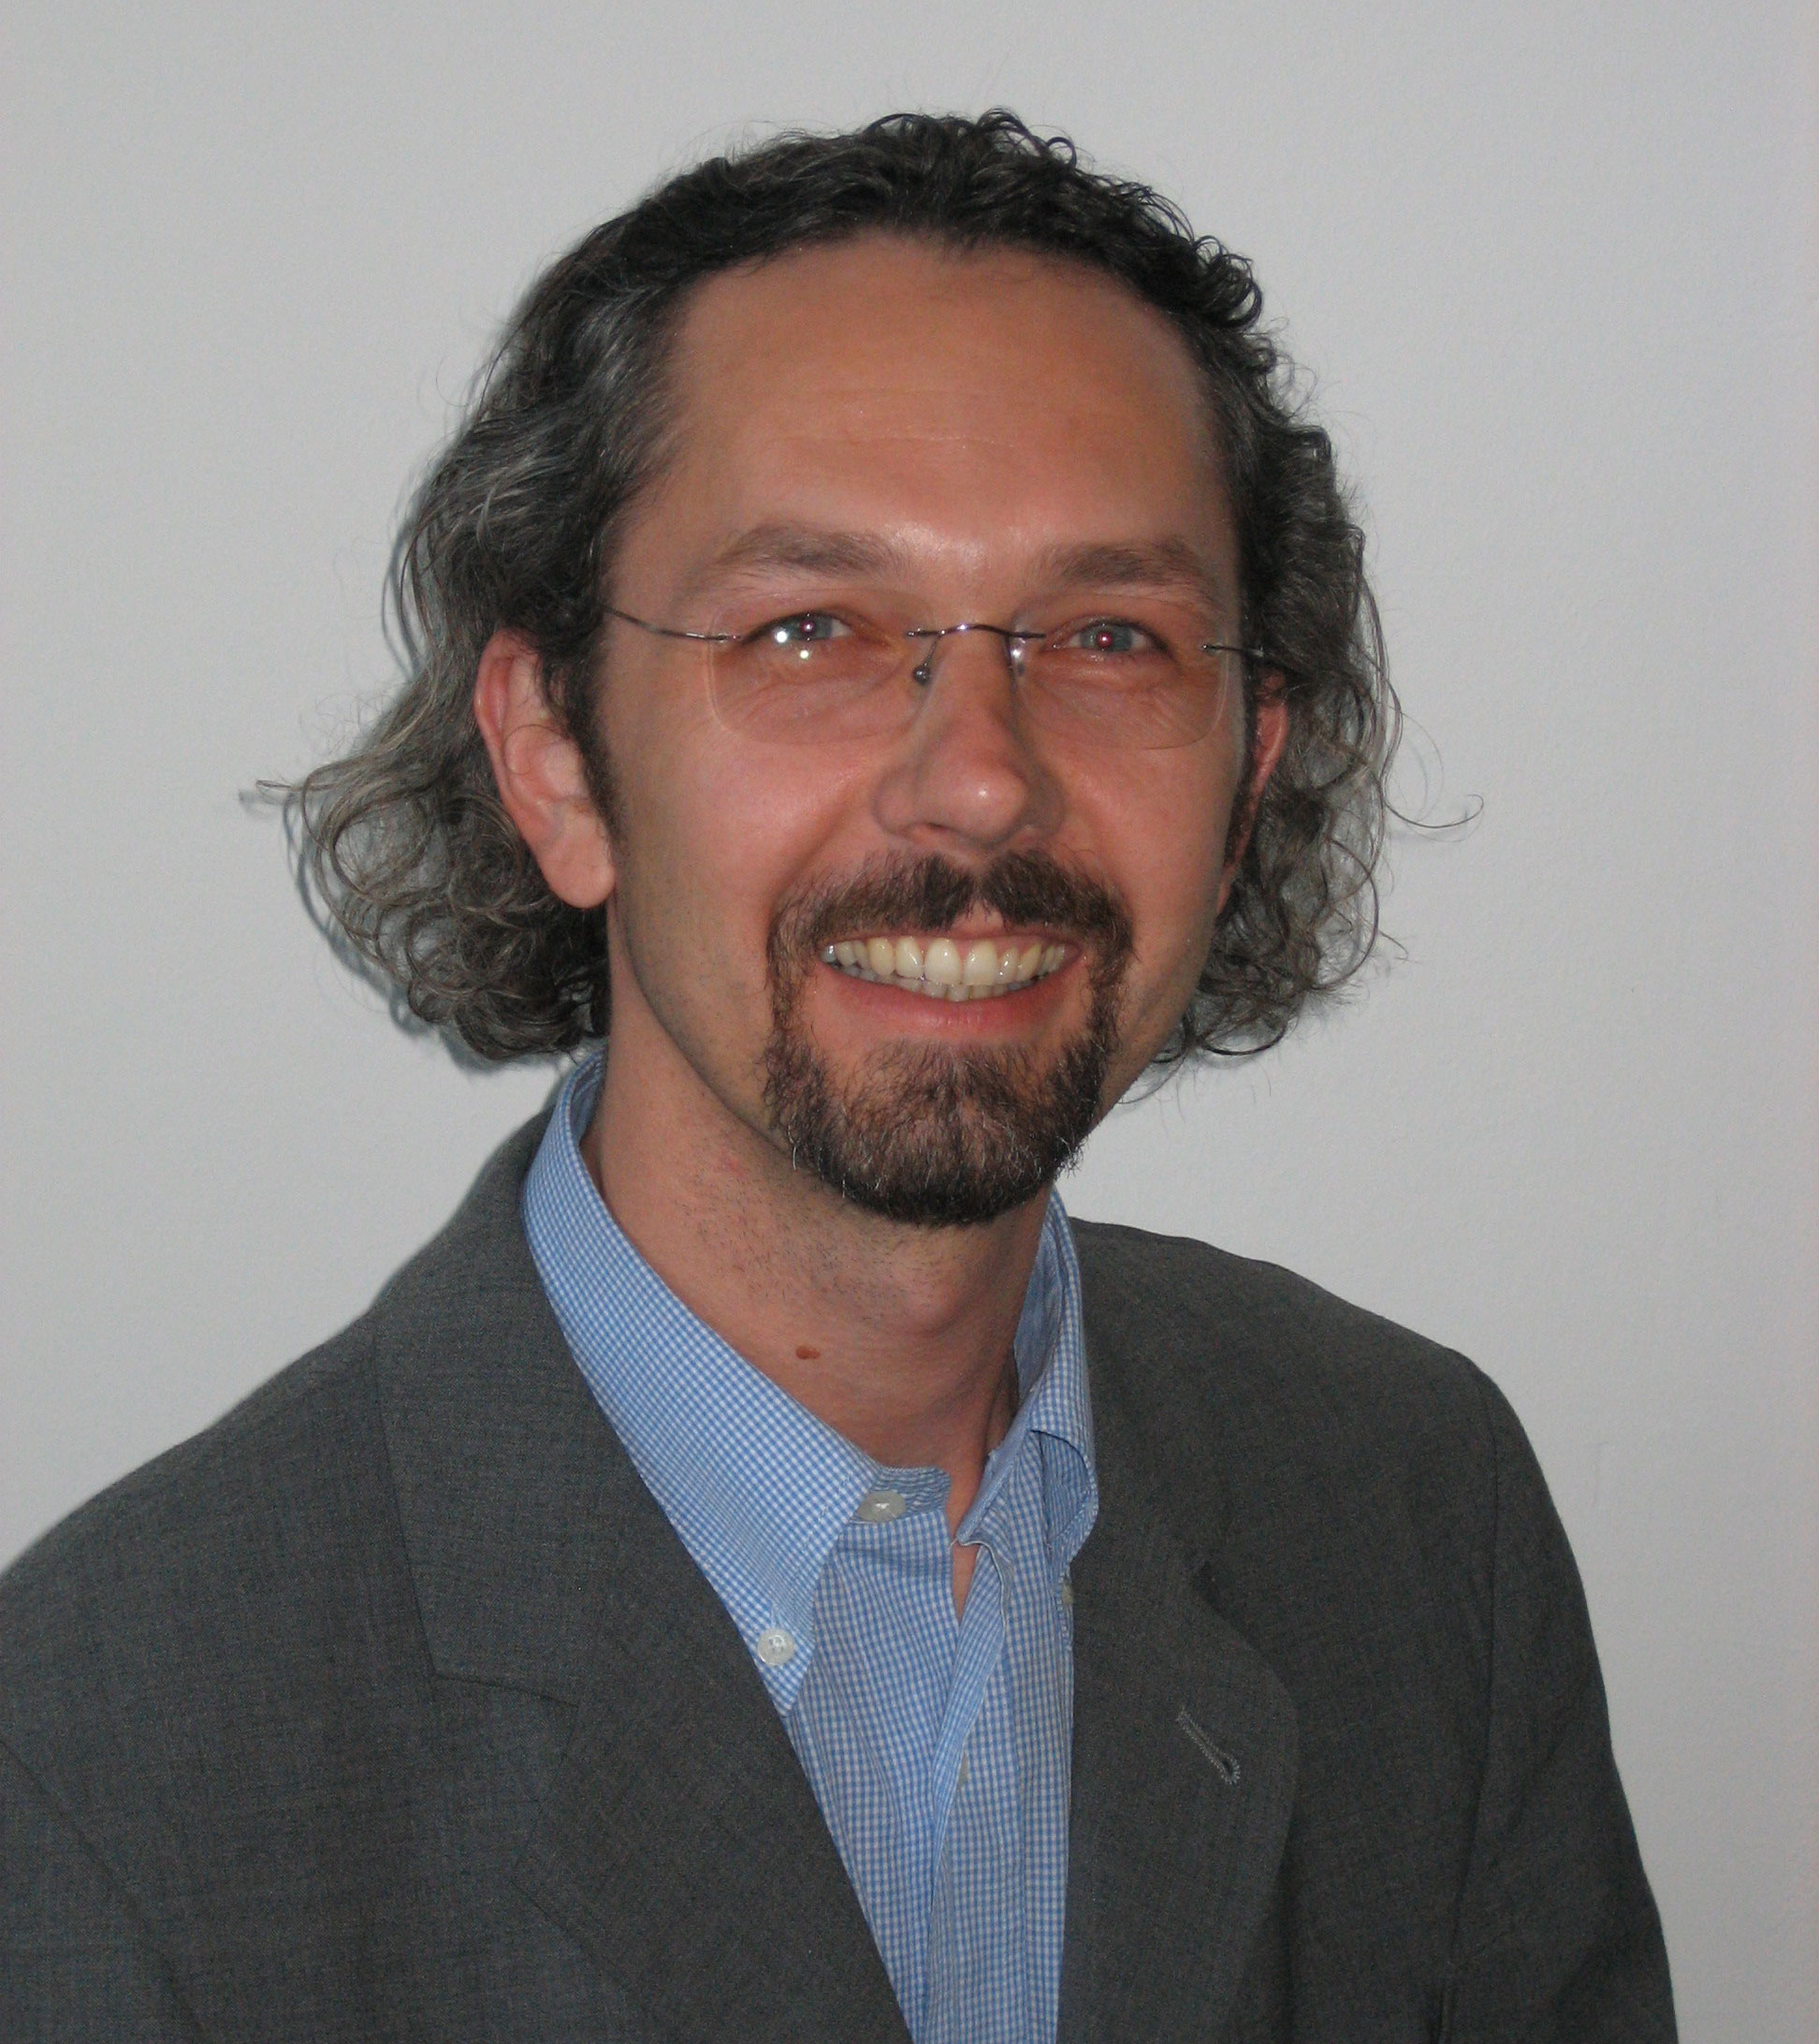 Siegfried Pöchtrager